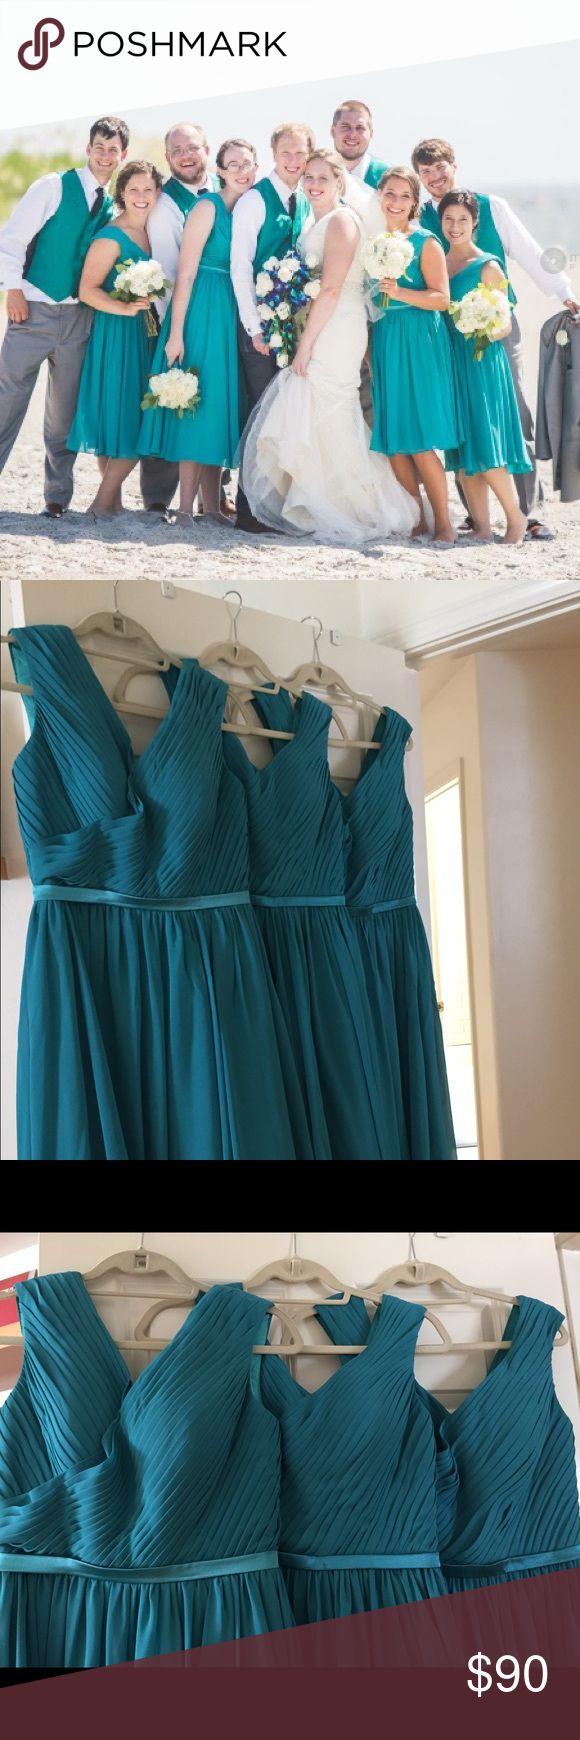 Top 25 best used bridesmaid dresses ideas on pinterest blue 3 turquoise bridesmaid dresses ombrellifo Choice Image